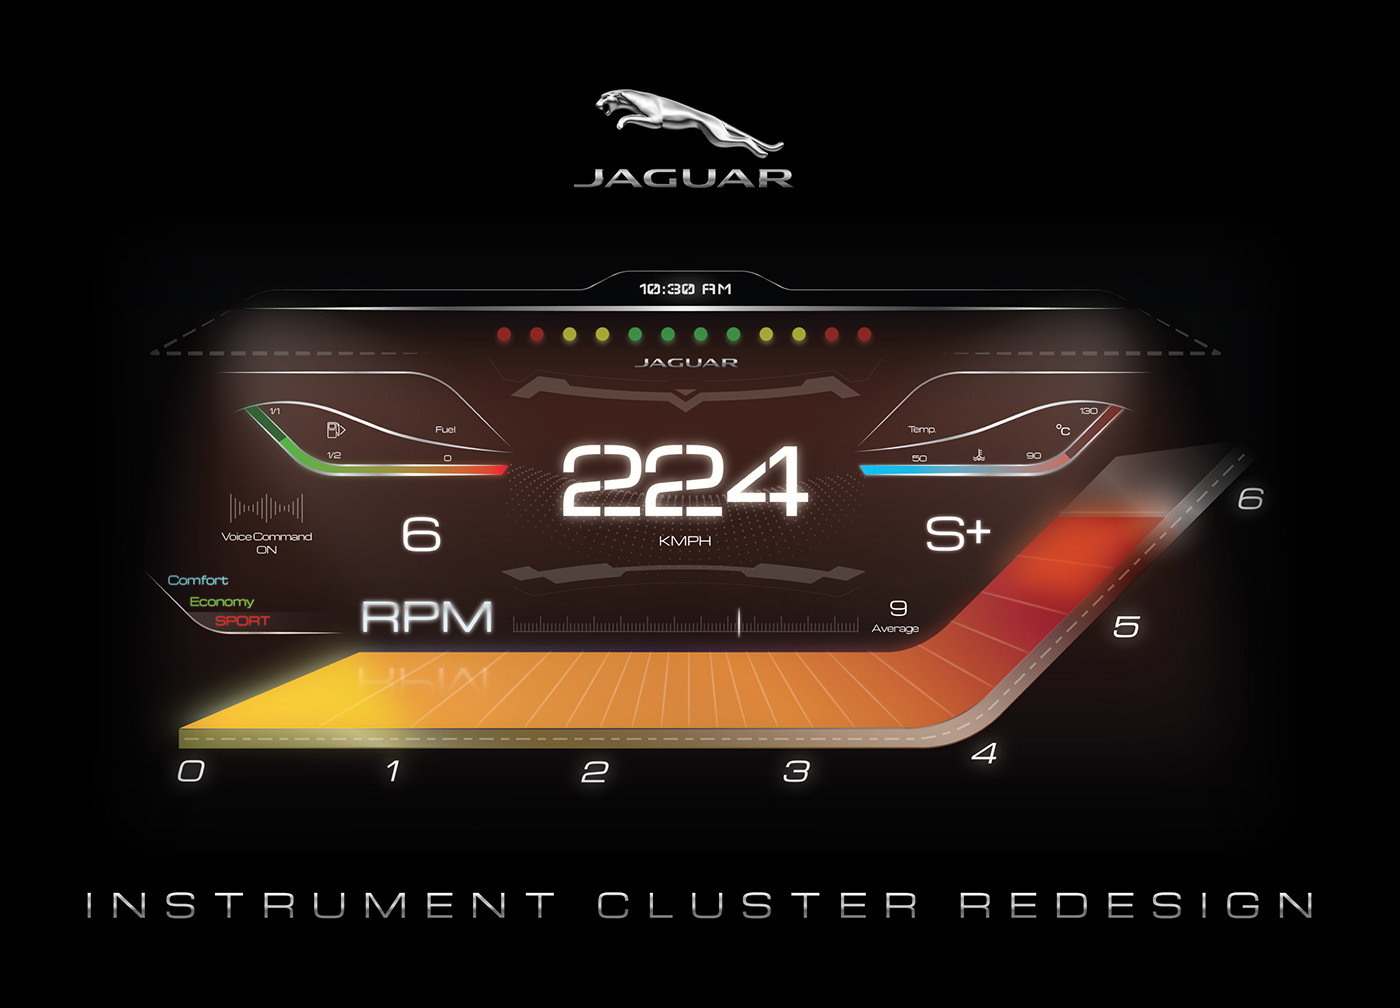 jaguar uiux modern futuristic speedometer graphic design  user interface digital dash instrument cluster  Car UI